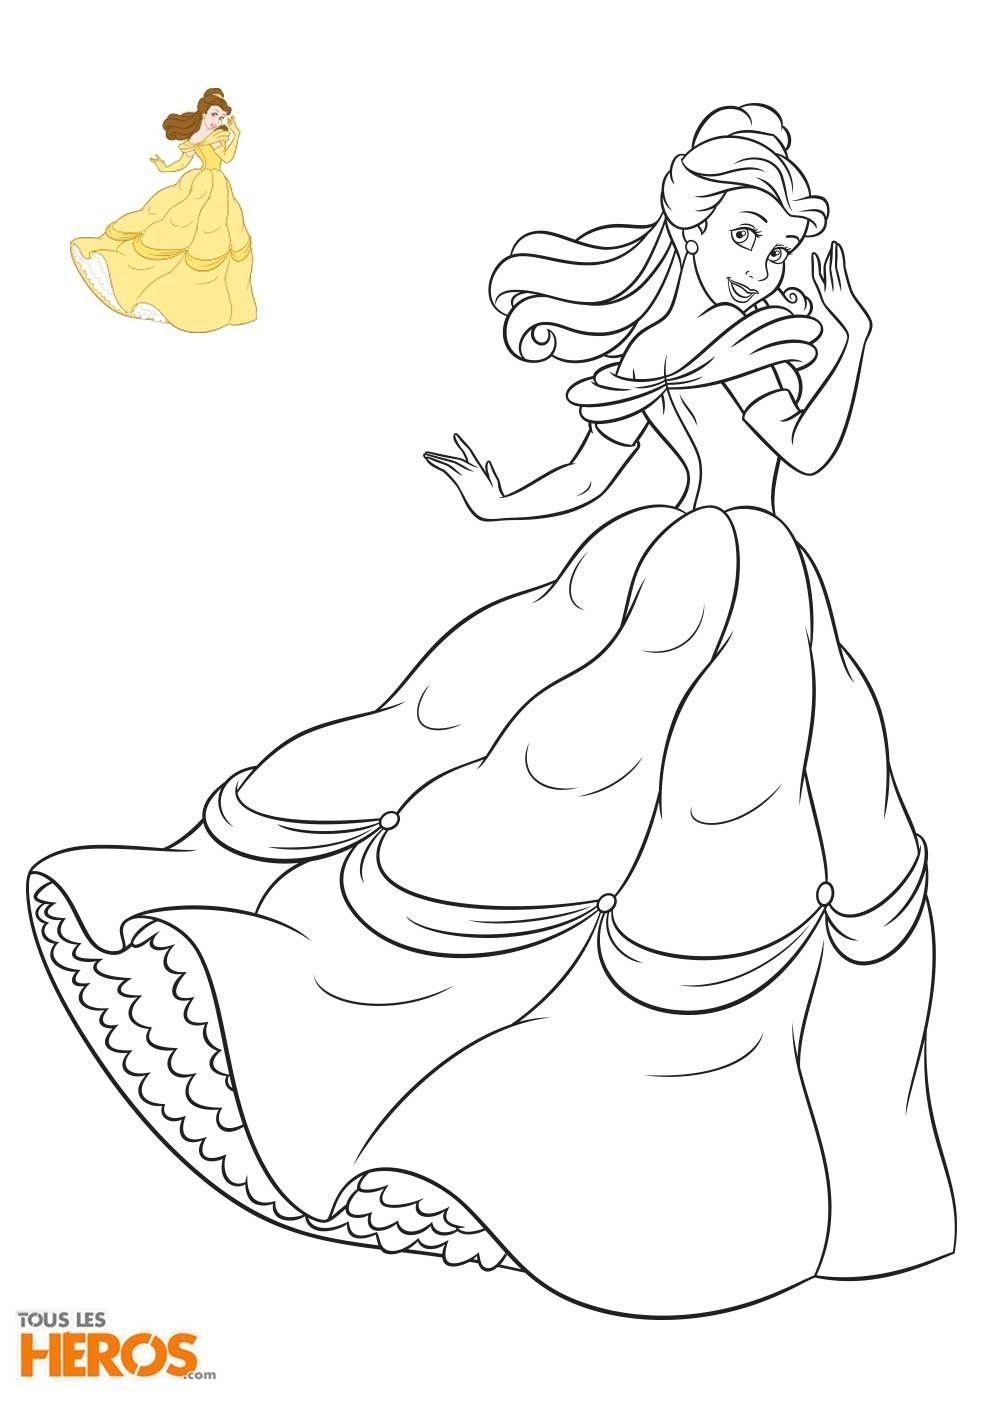 Princesse Belle Et La Bete Coloriage En 2020 Coloriage A Imprimer Princesse Coloriage La Belle Et La Bete Coloriage